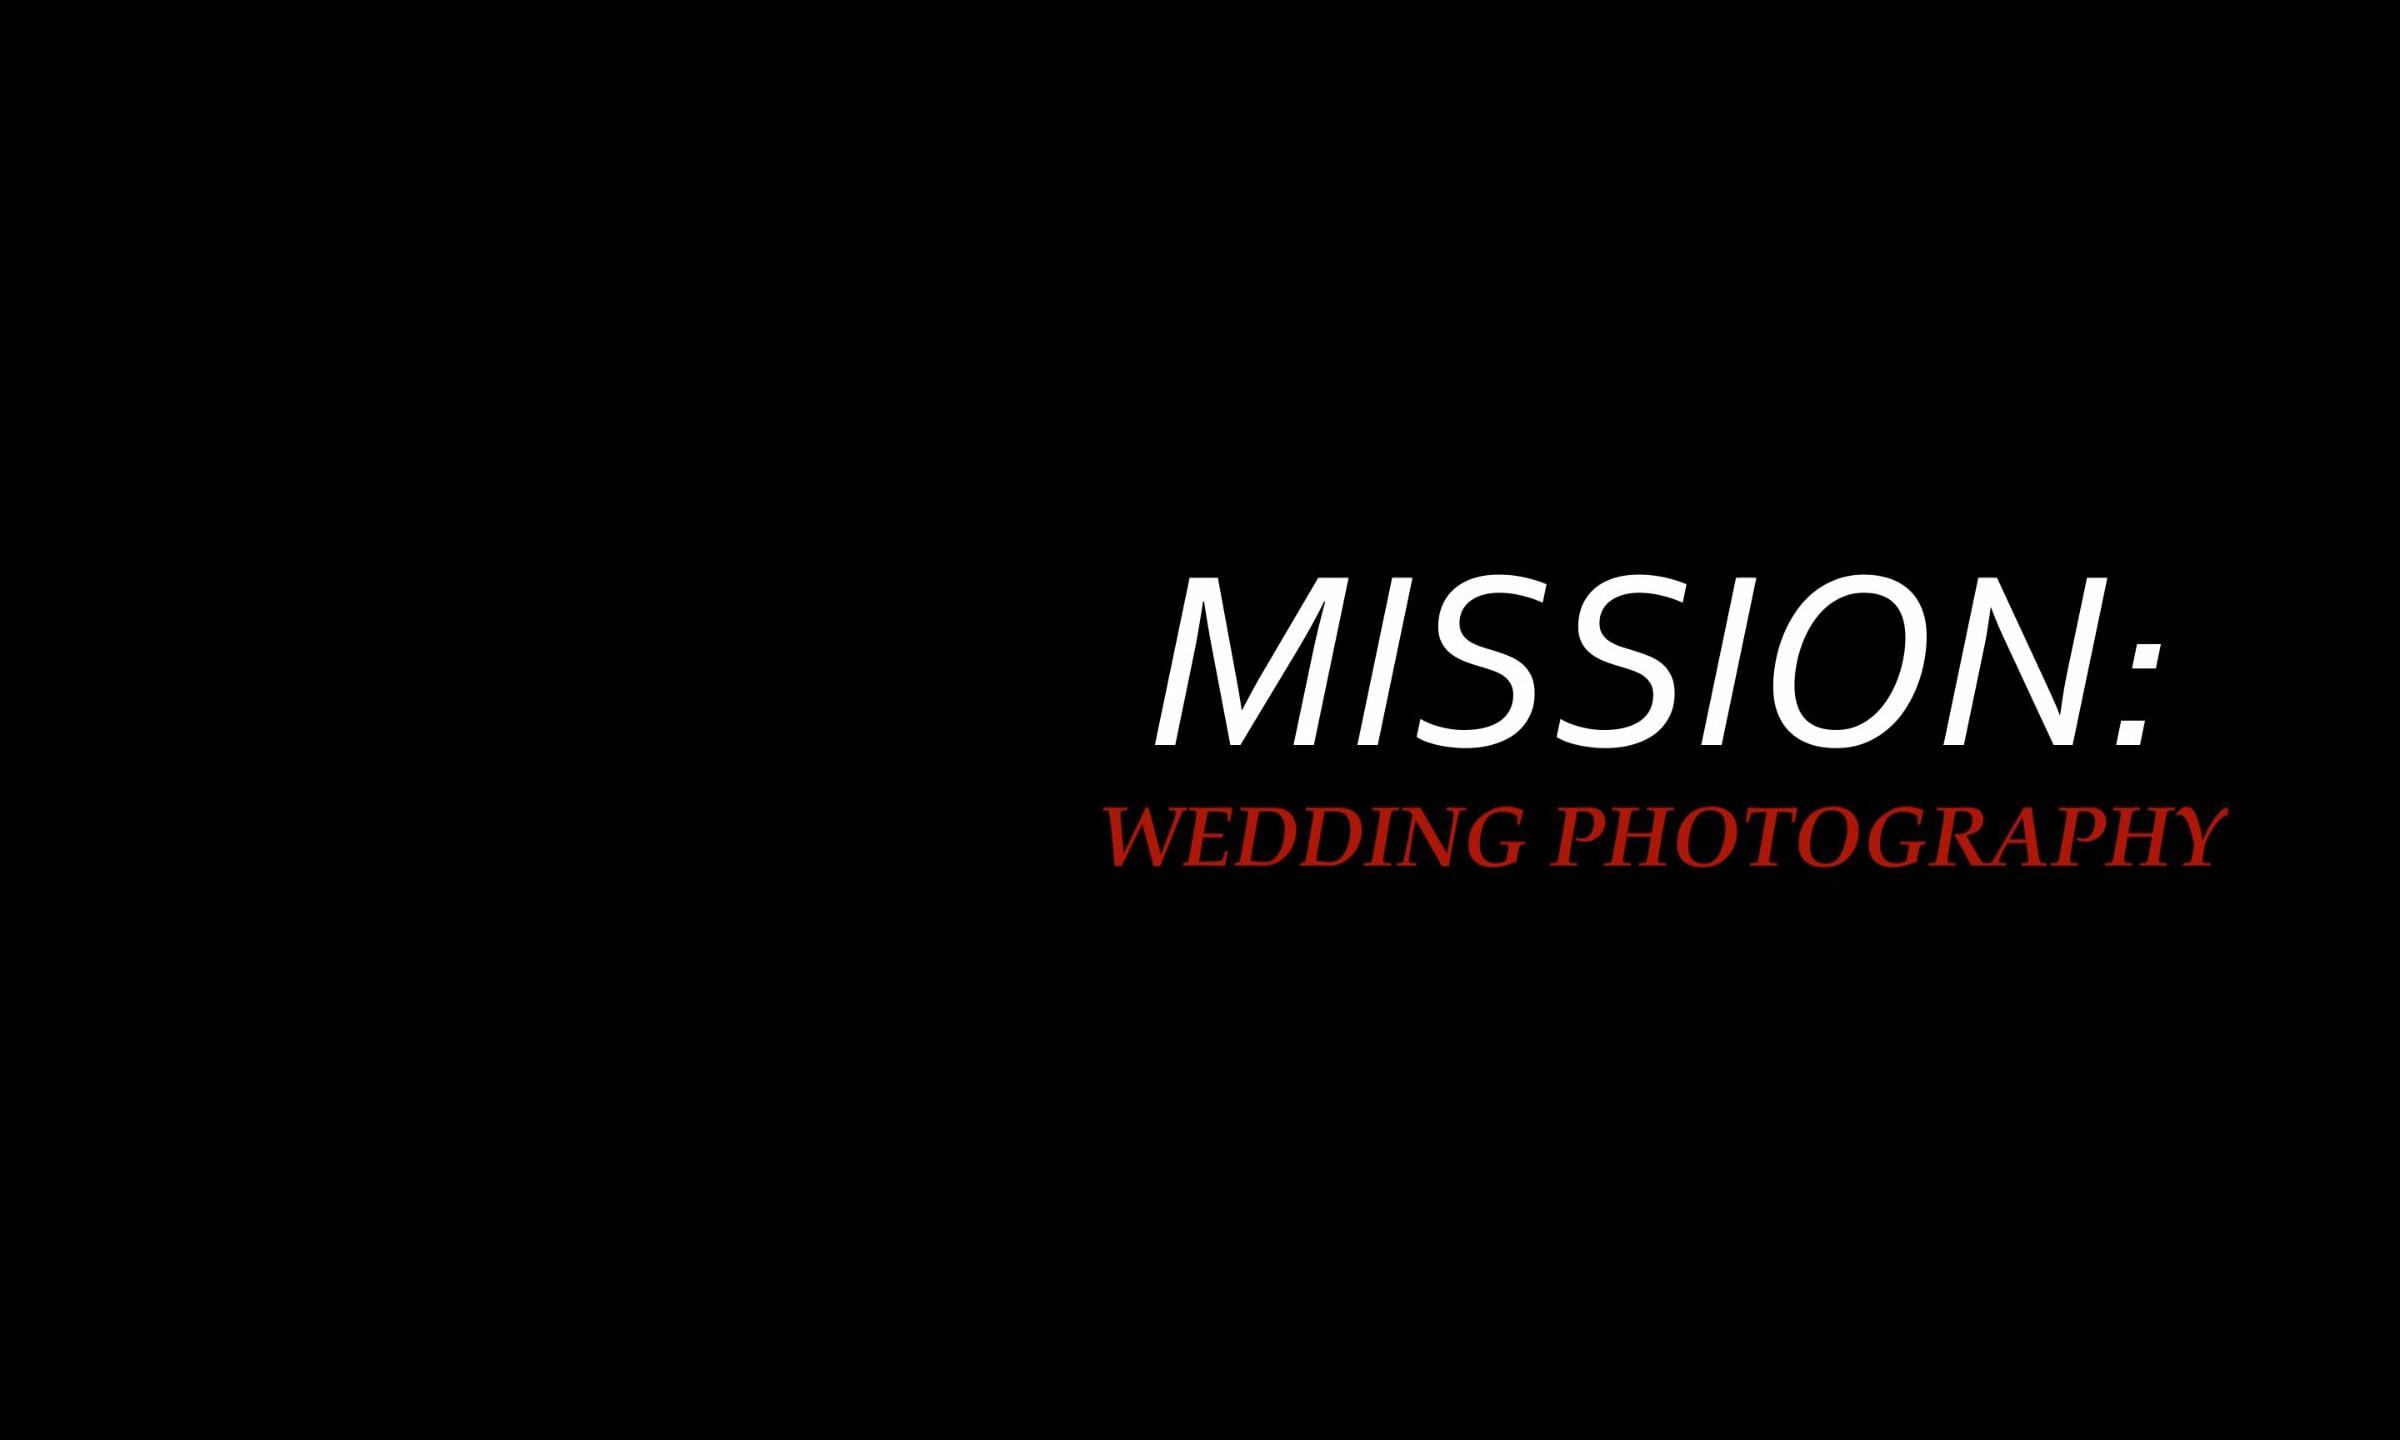 Mission: Wedding Photography